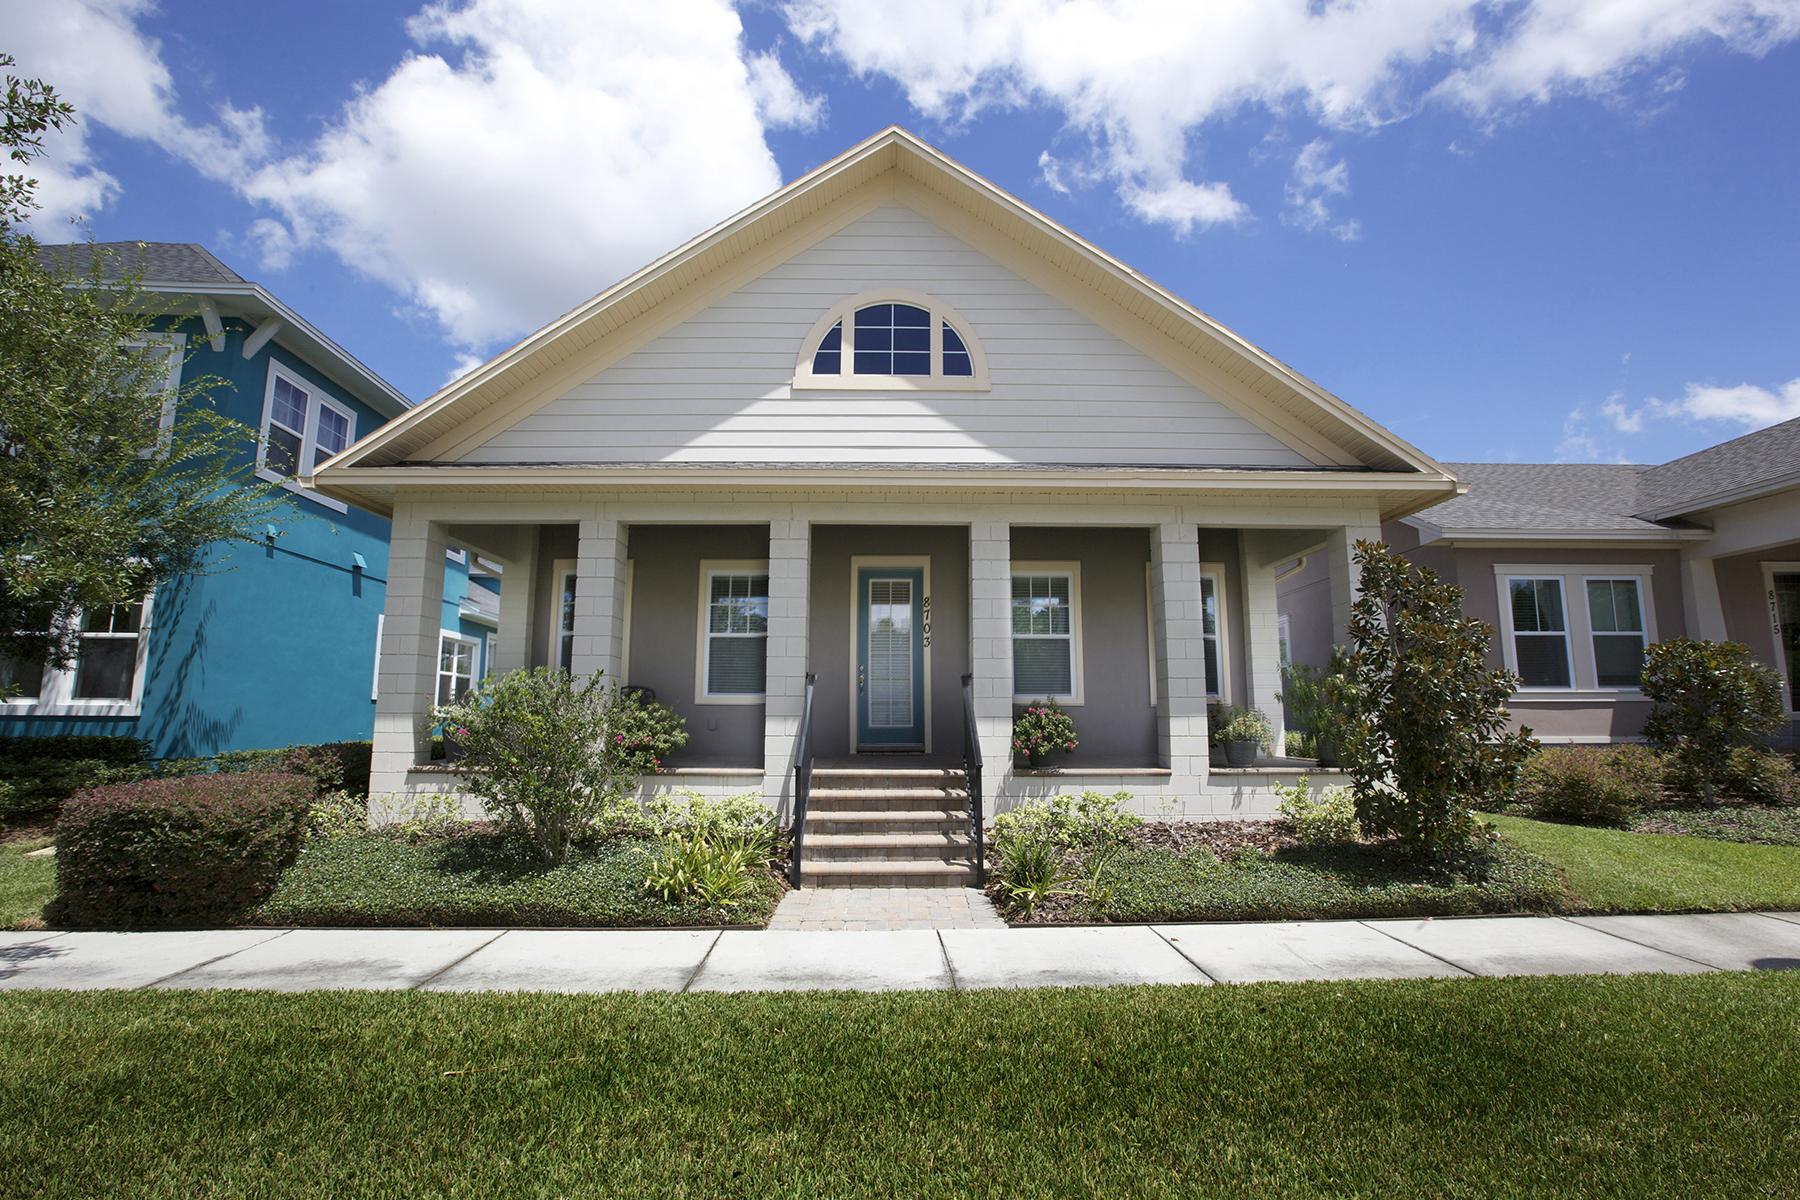 Single Family Home for Sale at LAKE NONA 8703 Laureate Blvd Orlando, Florida, 32827 United States